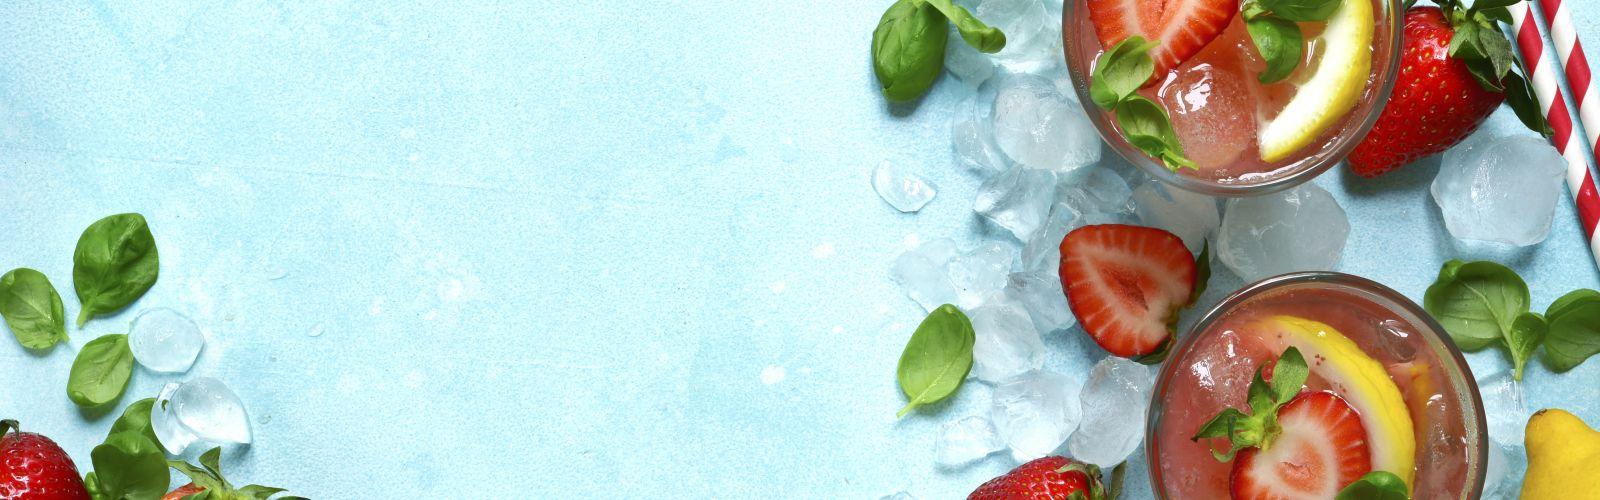 cups of strawberry basil lemonade